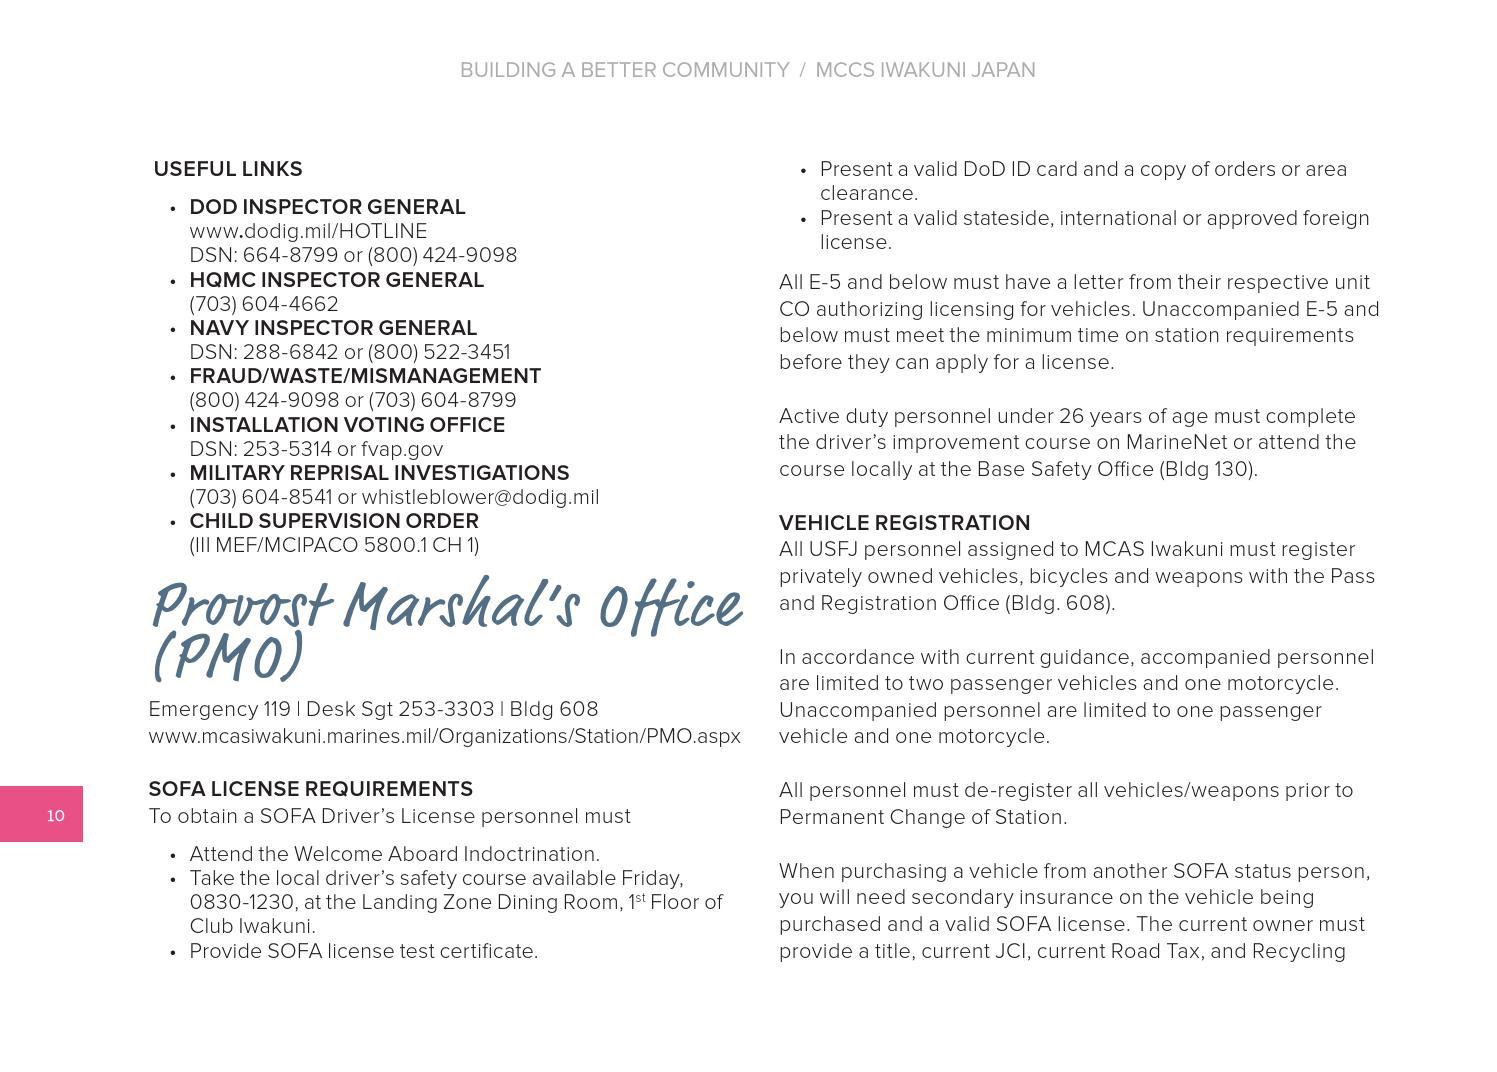 driver improvement course marine net - officecrise